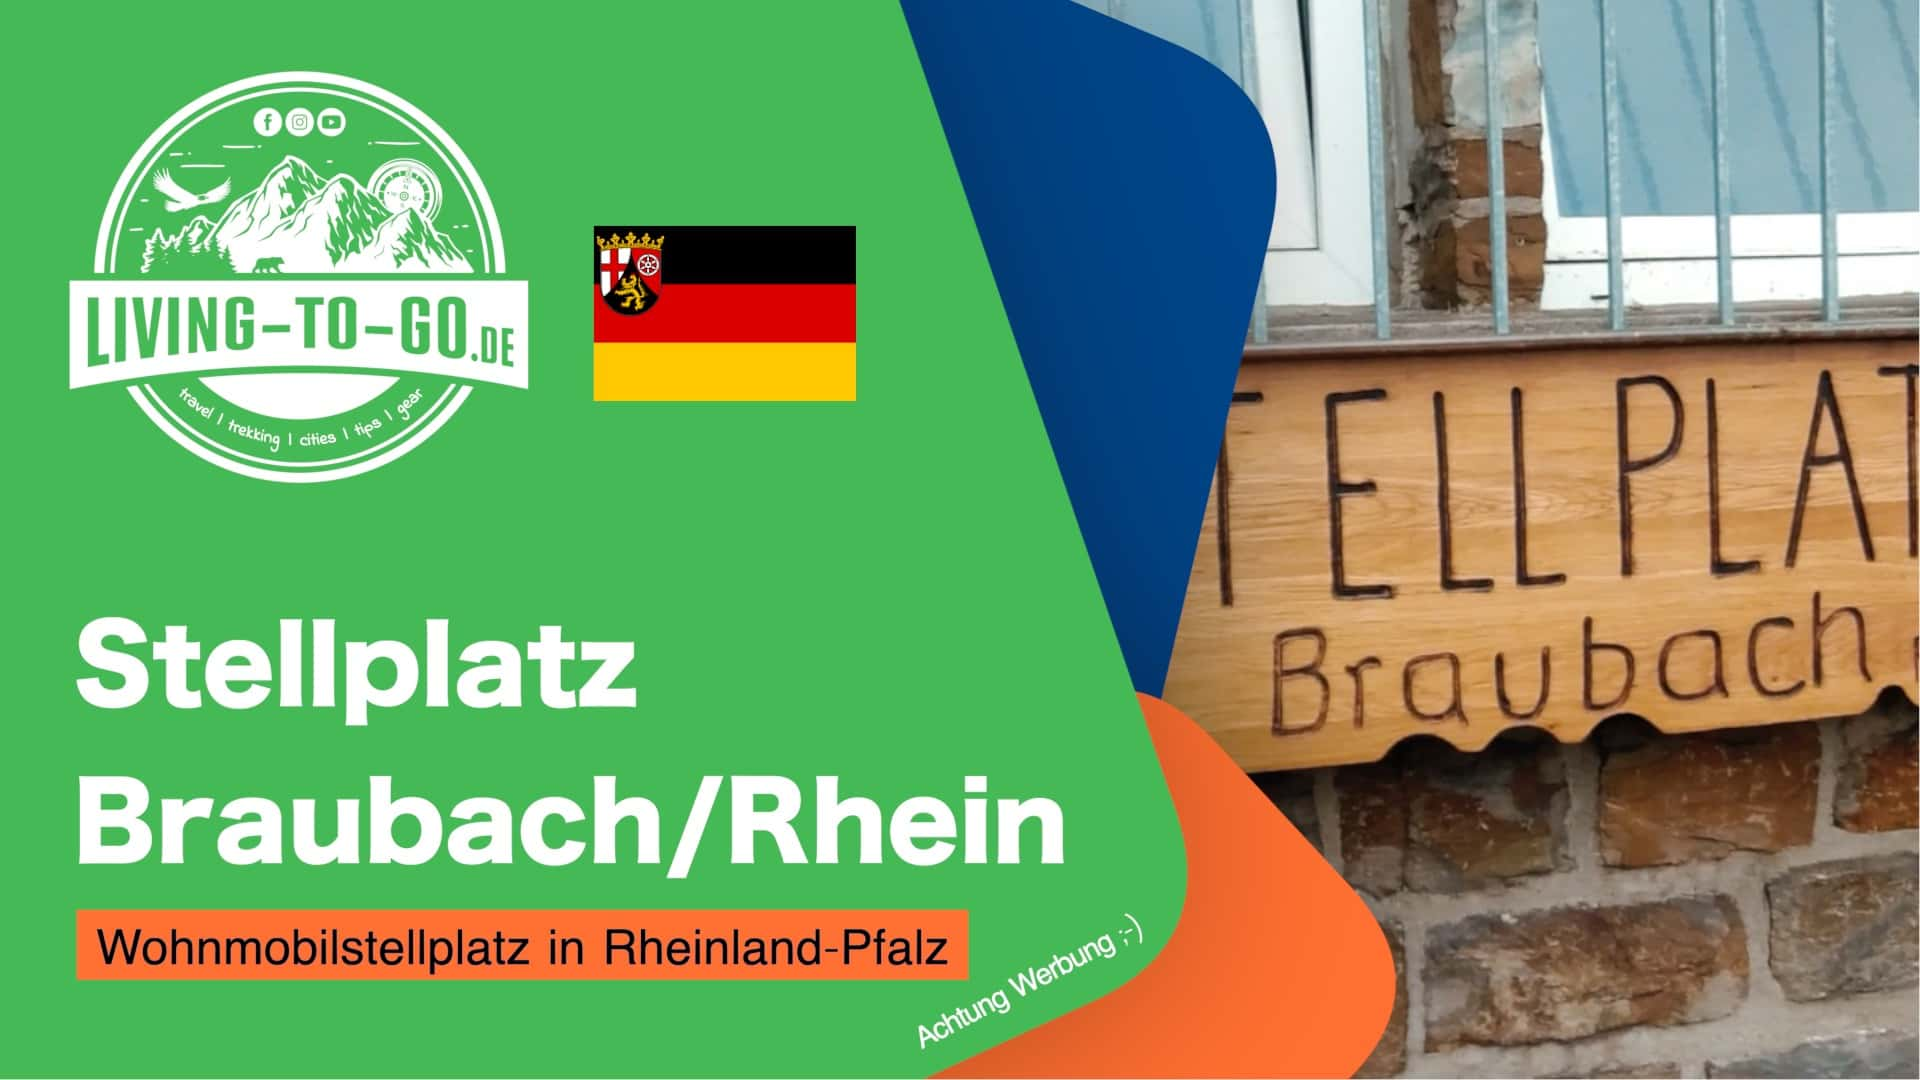 Stellplatz Braubach